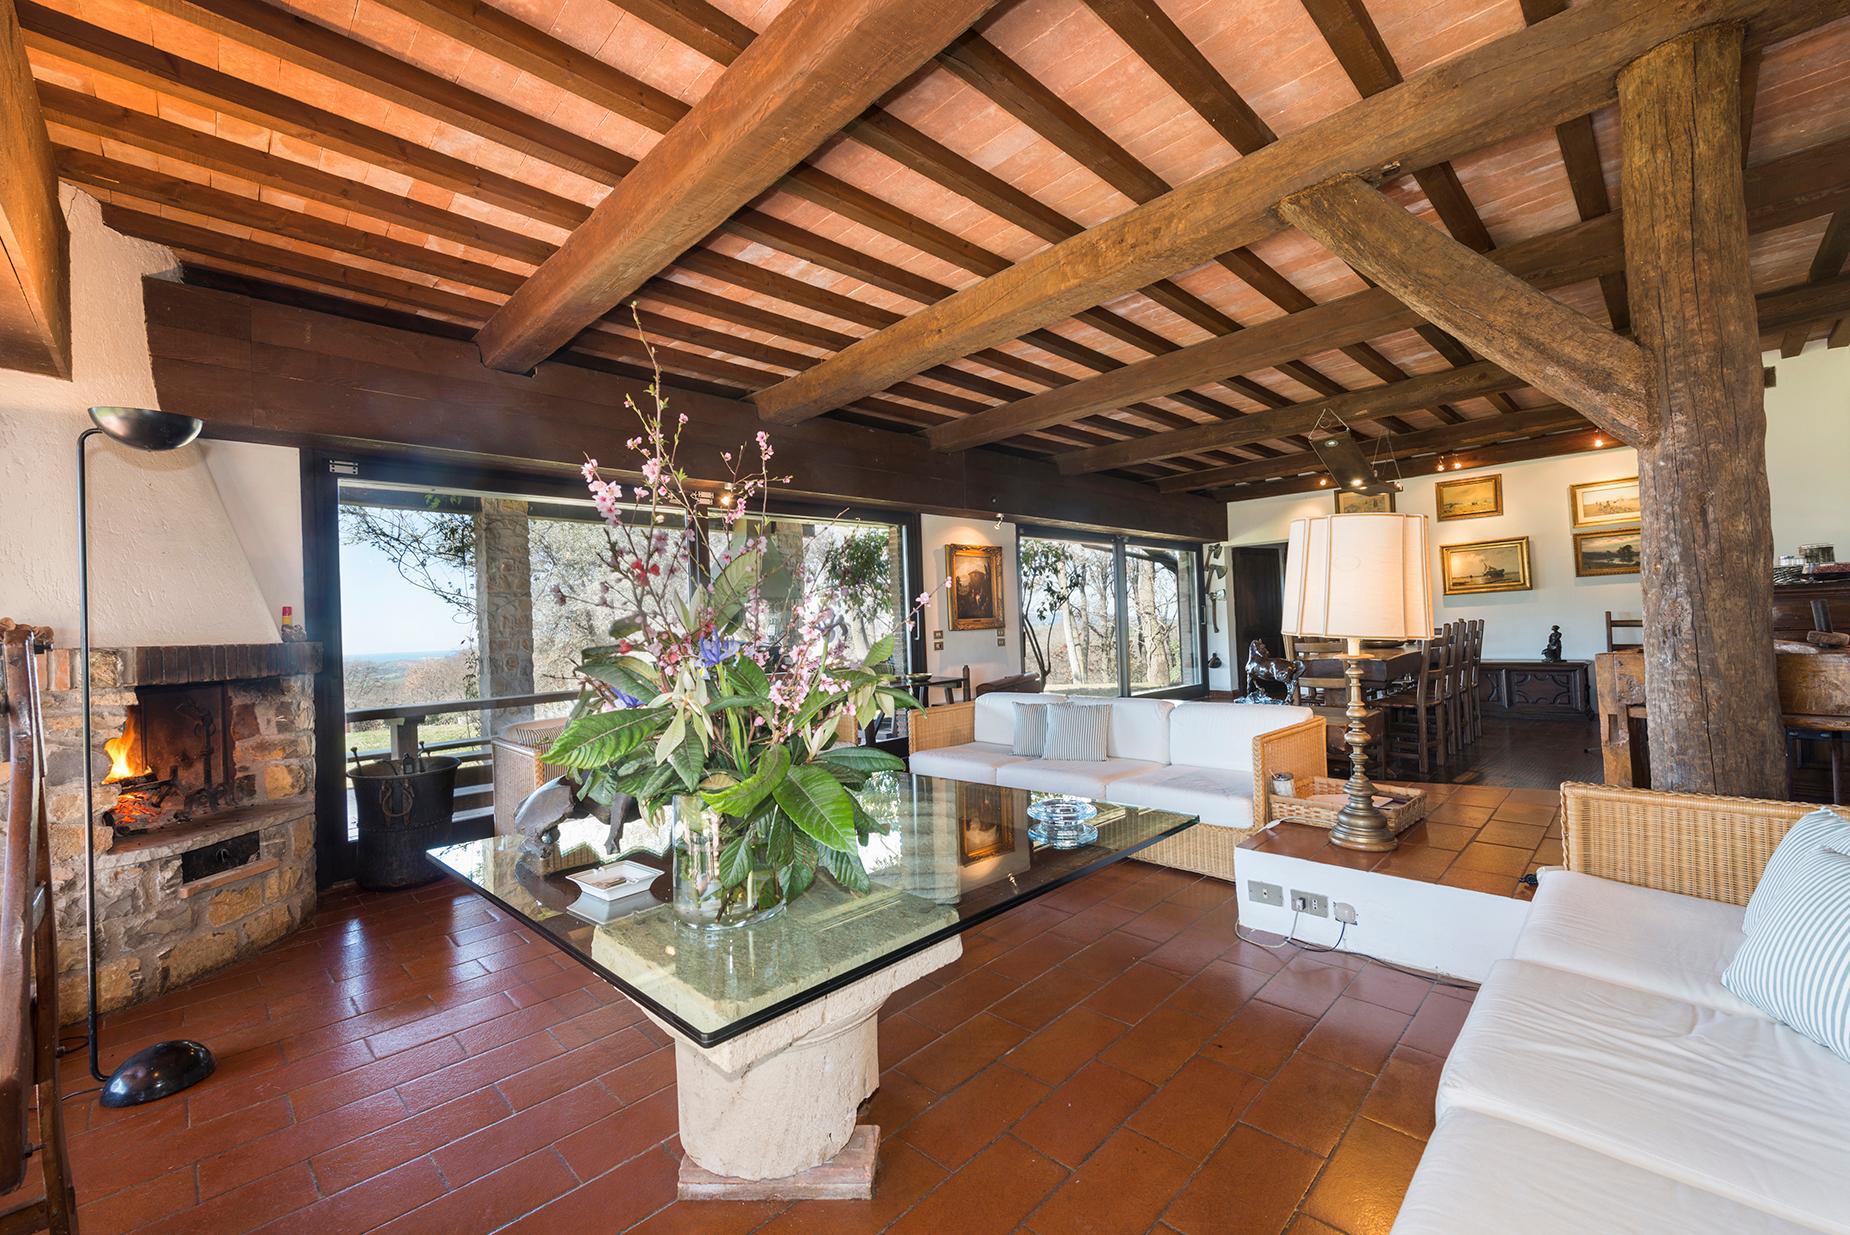 Splendida villa con viste mozzafiato del Monte Argentario - 5